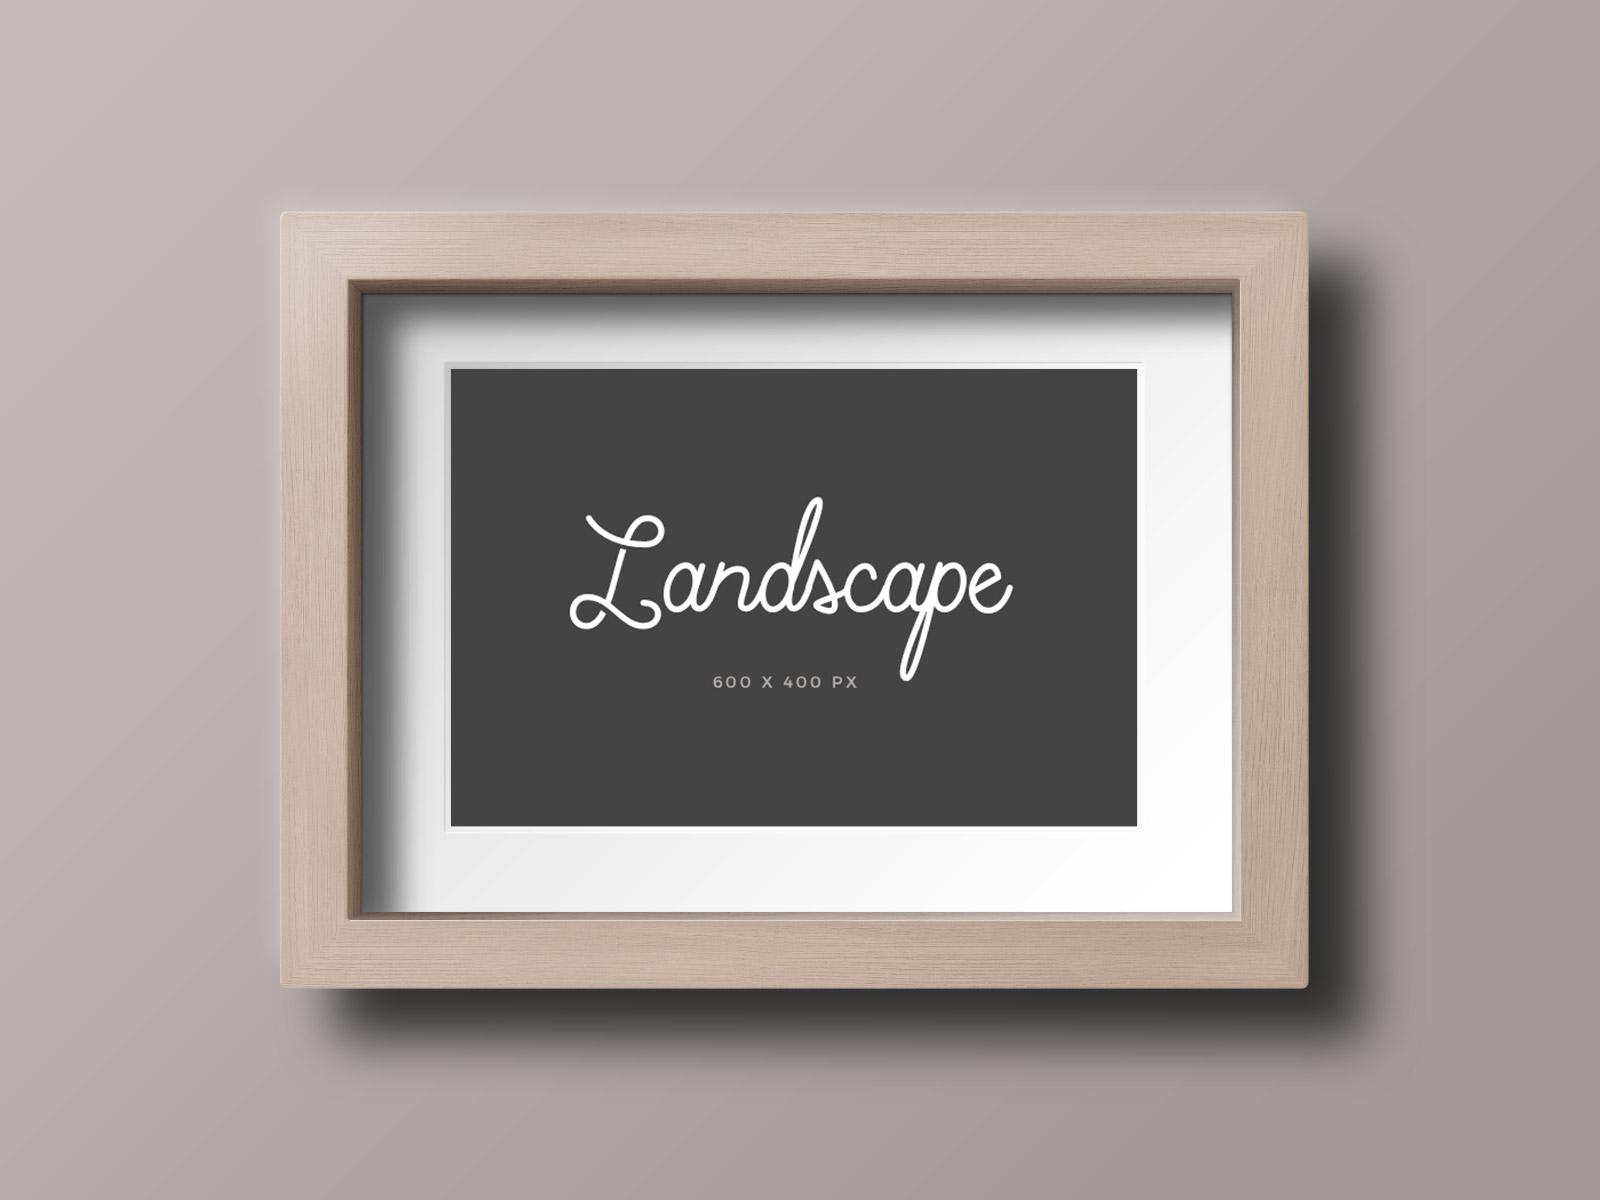 Free-Wood-Photo-Frame-Mockup-PSD-Landscape